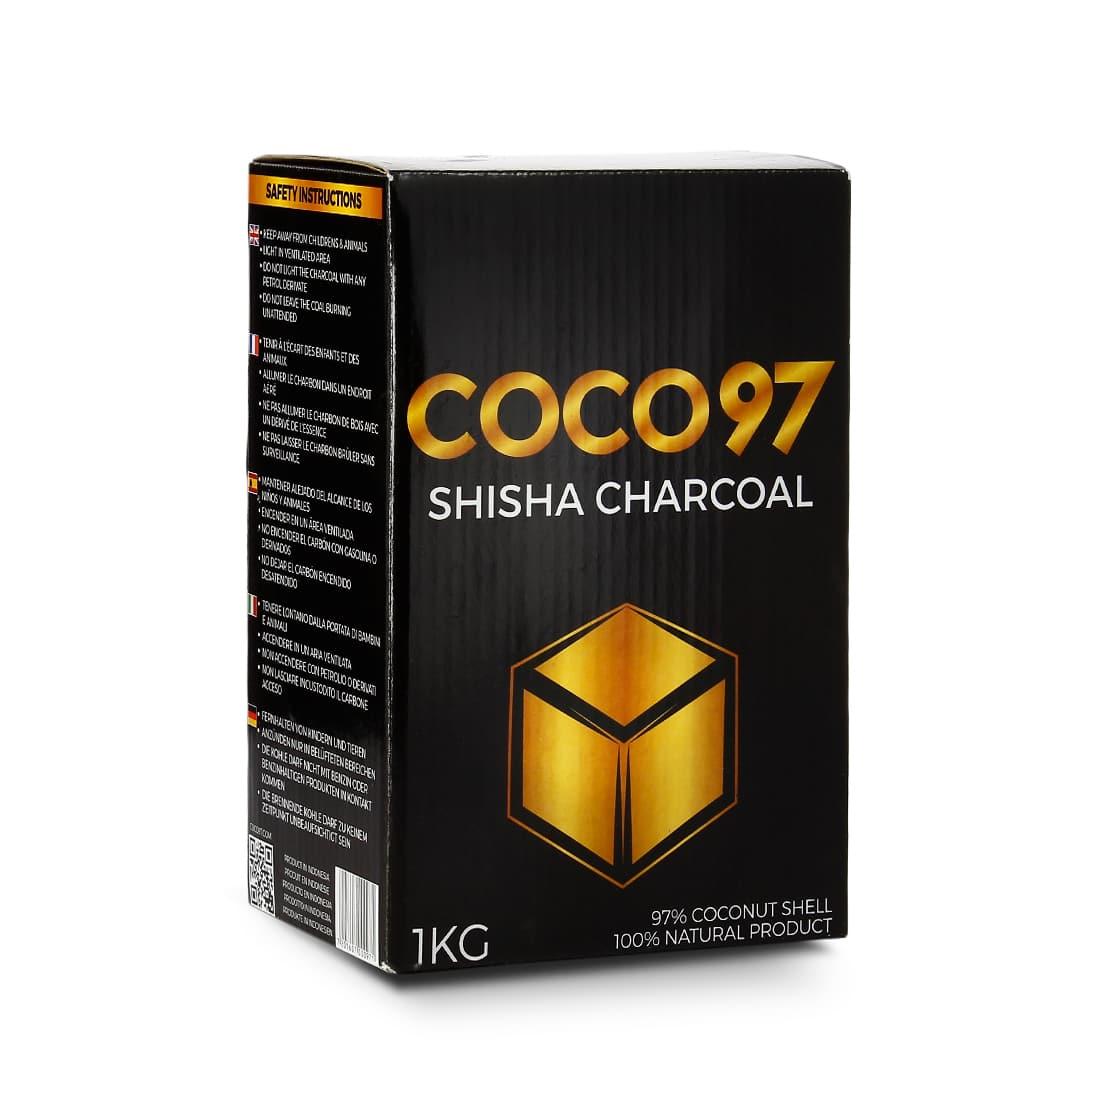 Photo de Charbon chicha Coco 97 1 kg